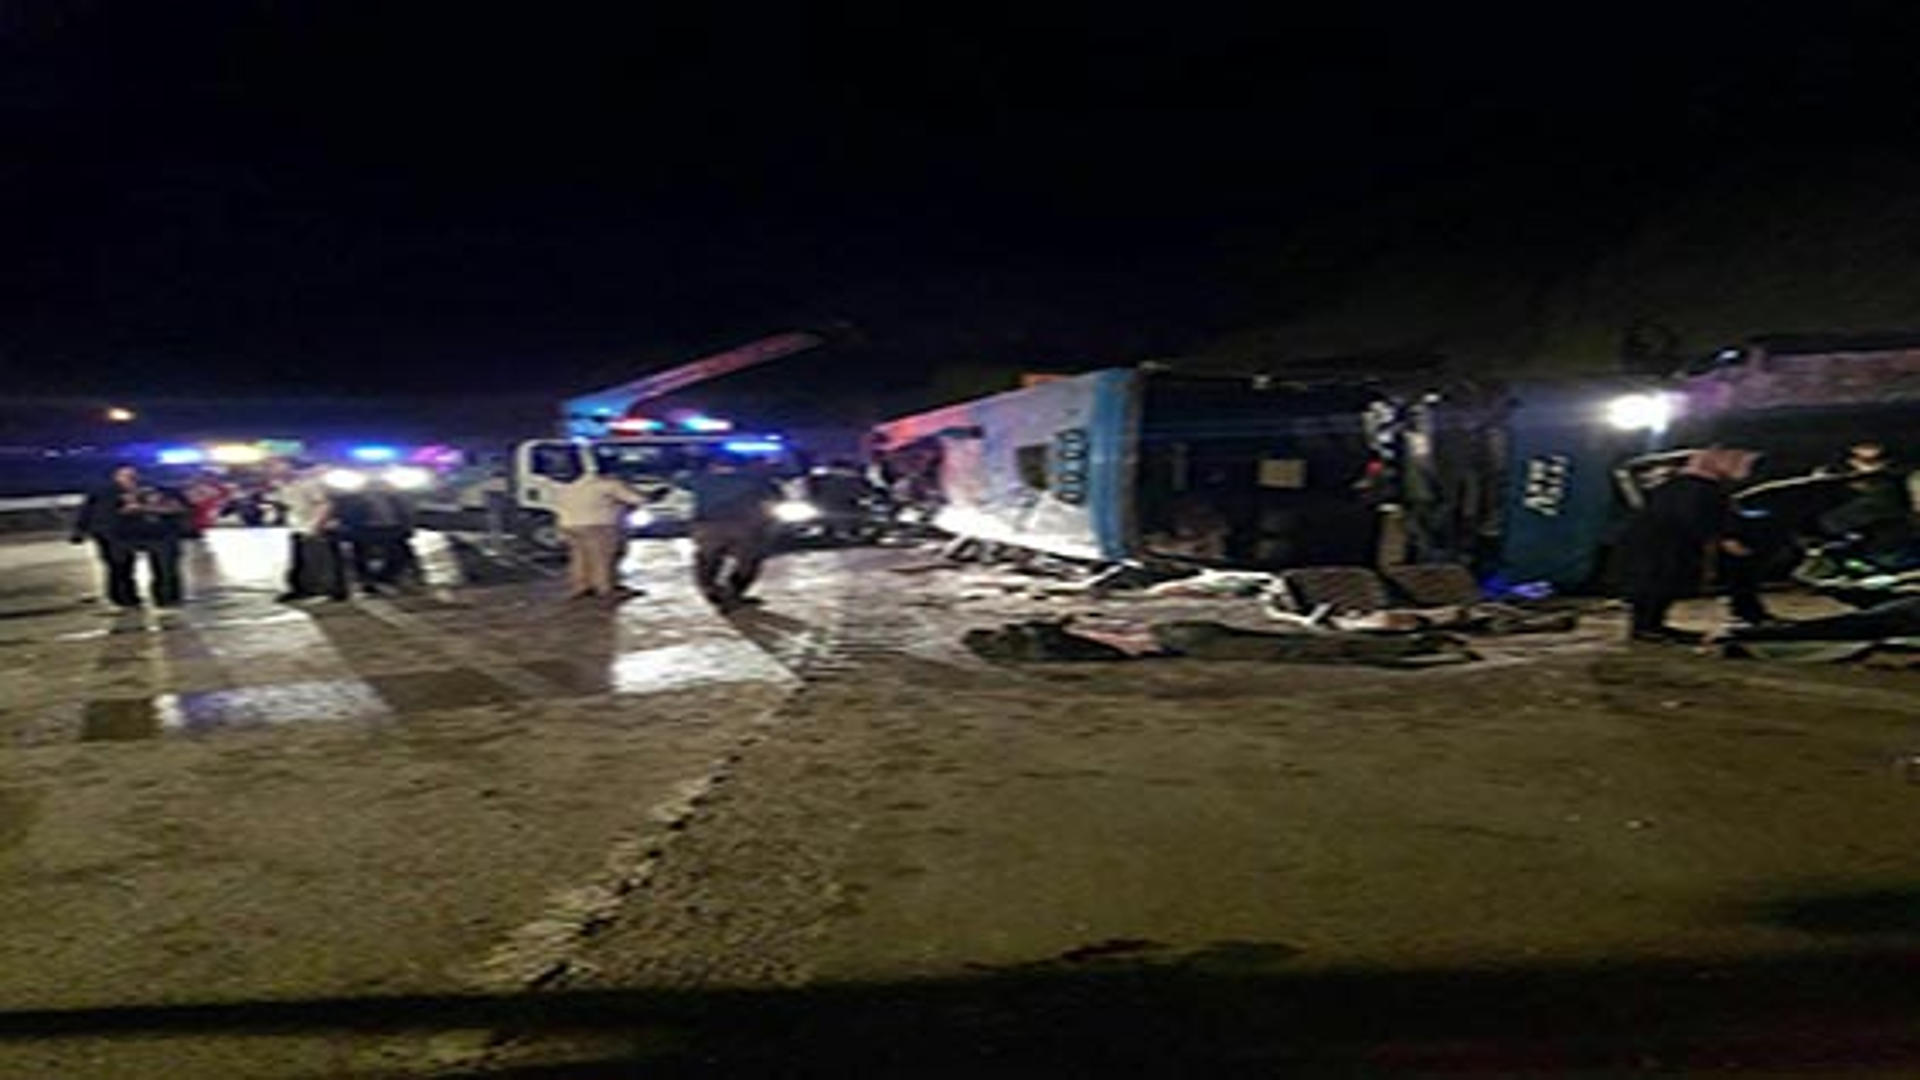 جزئیات حادثه سقوط اتوبوس تهران - گنبد در محور سواد کوه | فیلم